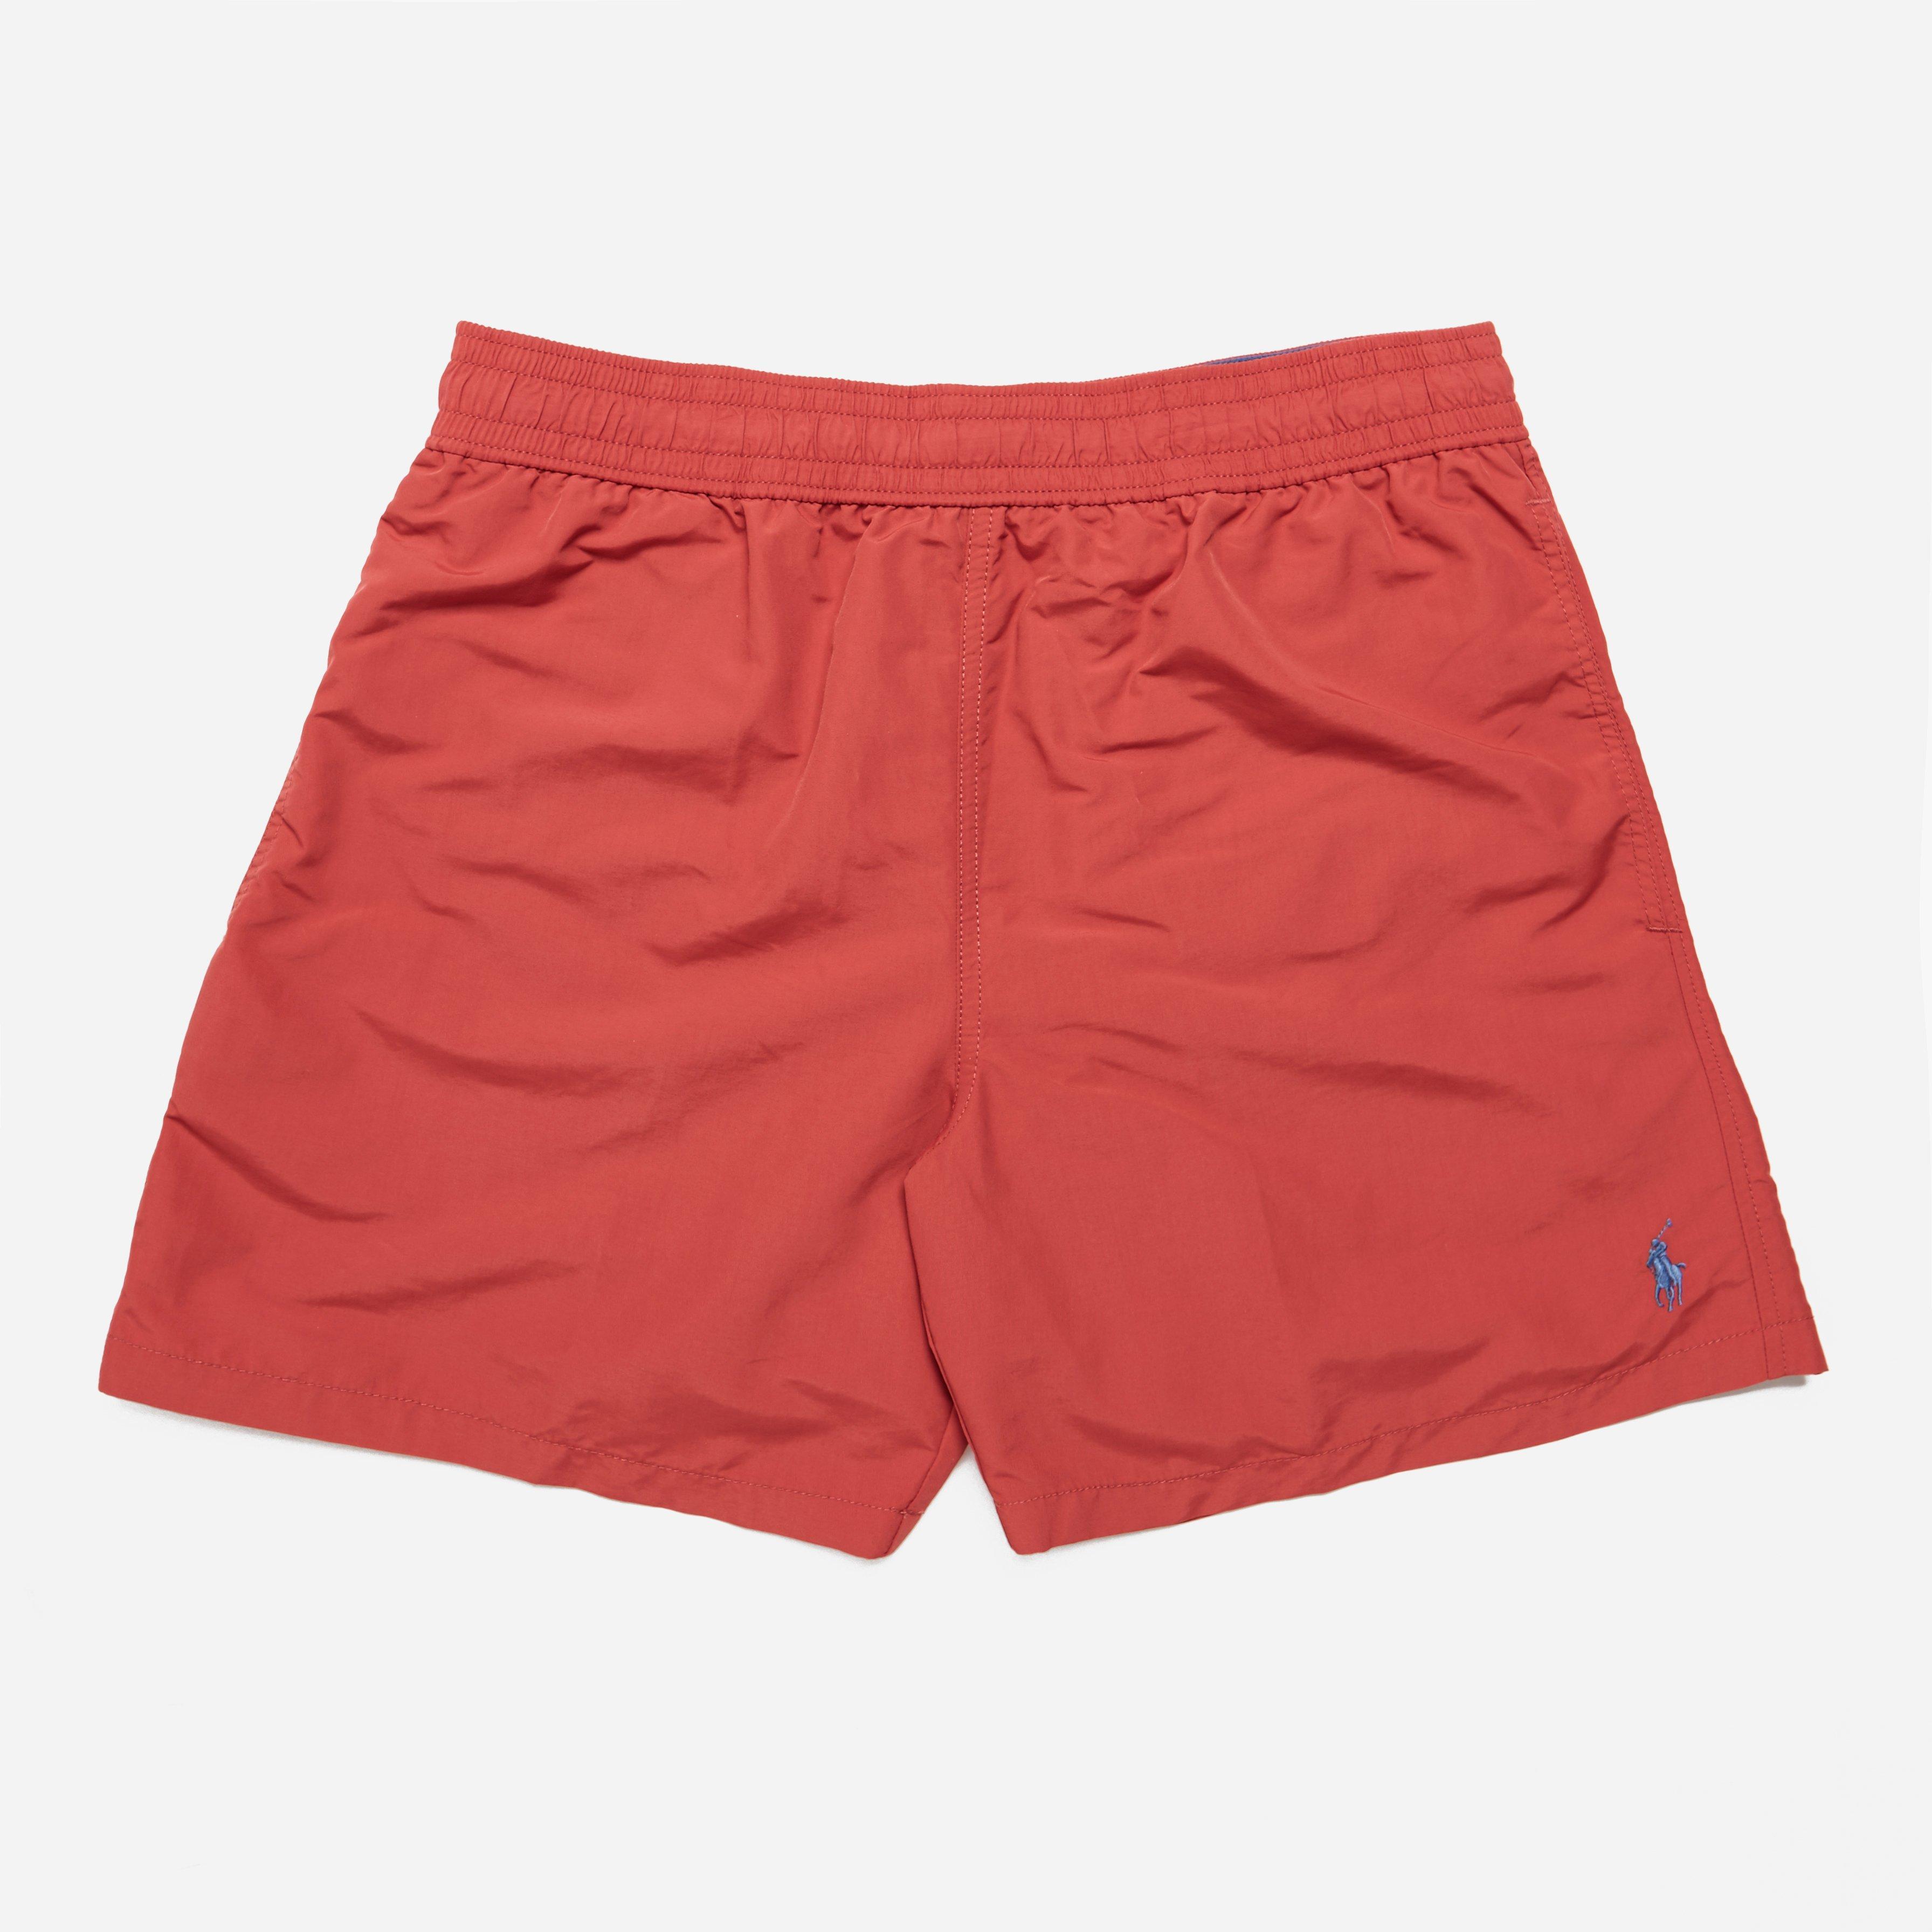 Polo Ralph Lauren Hawaiian Swim Short